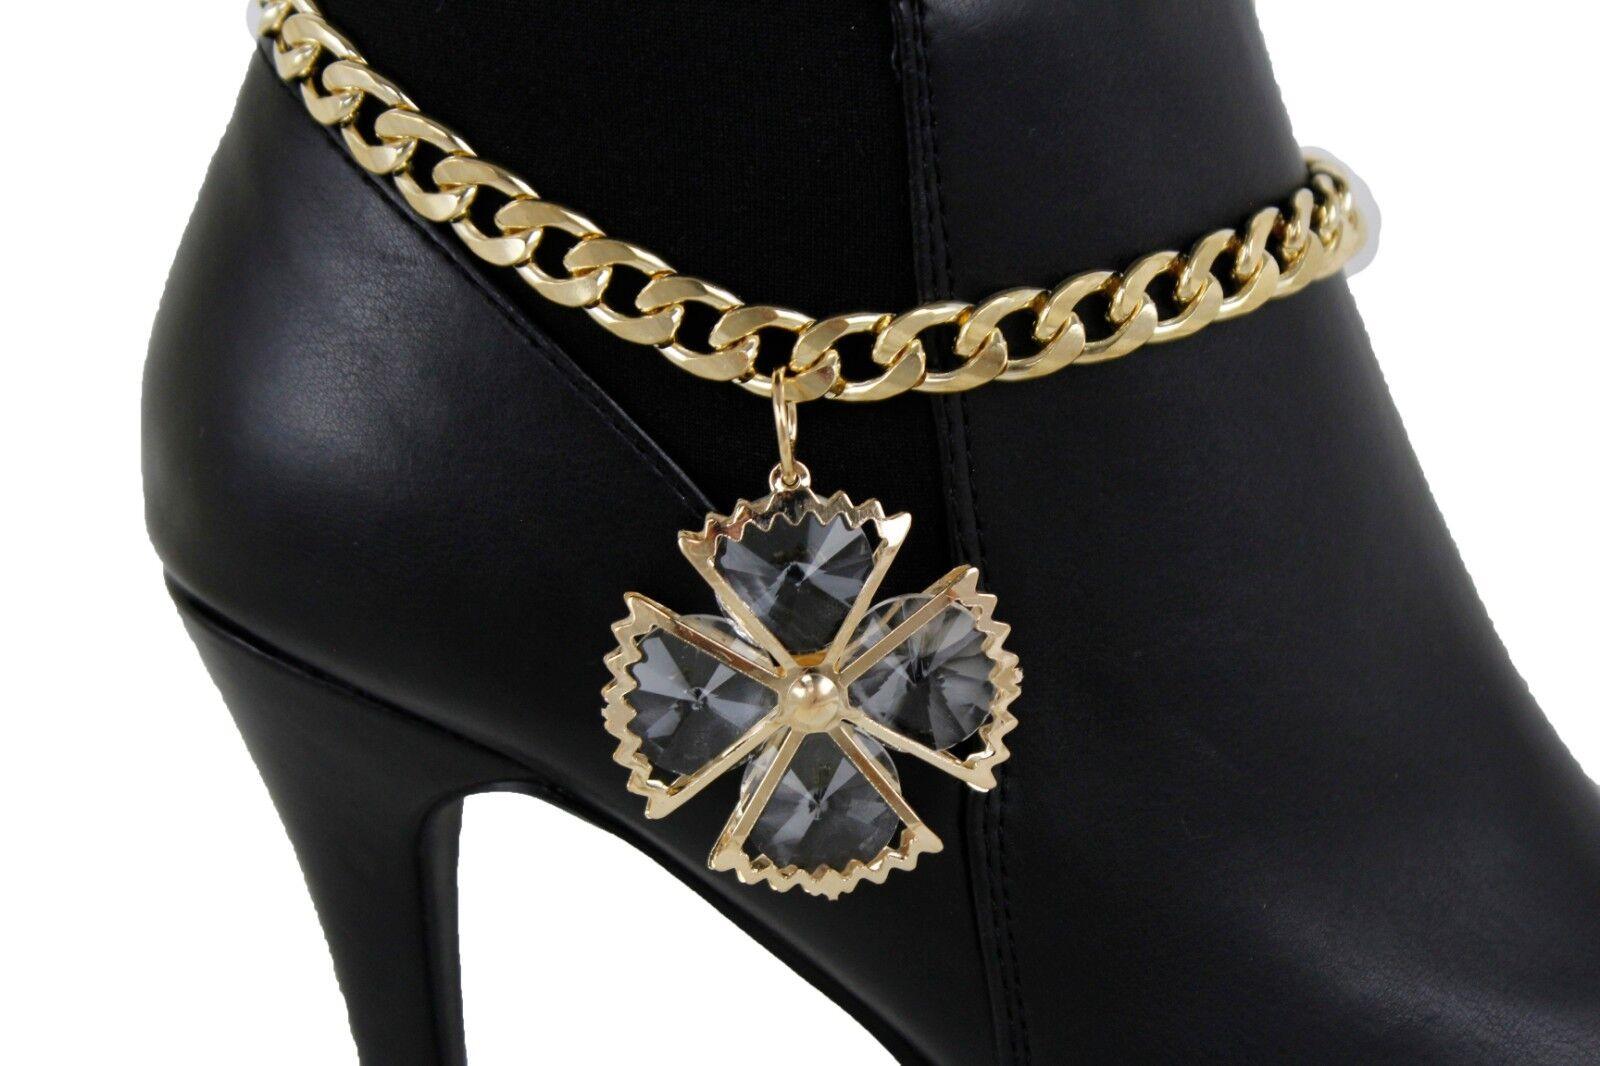 Western Women Gold Metal Chain Boot Bracelet Shoe Anklet Big Bling Flower Charm